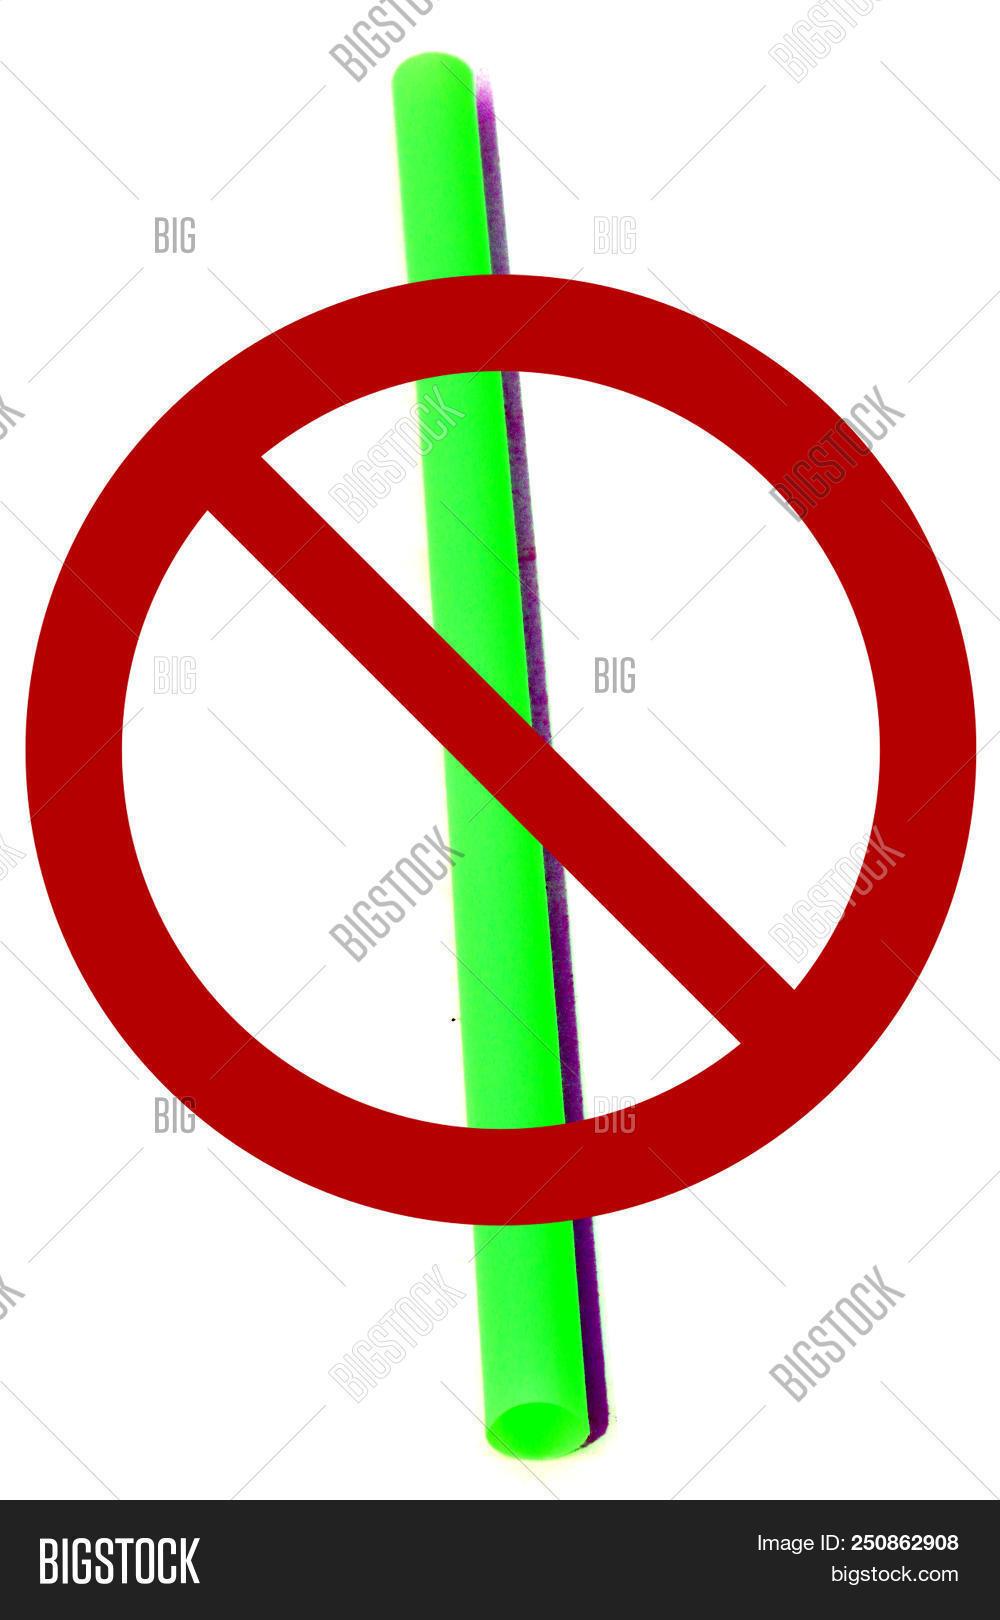 No Plastic Straws International Symbol Over Represents The